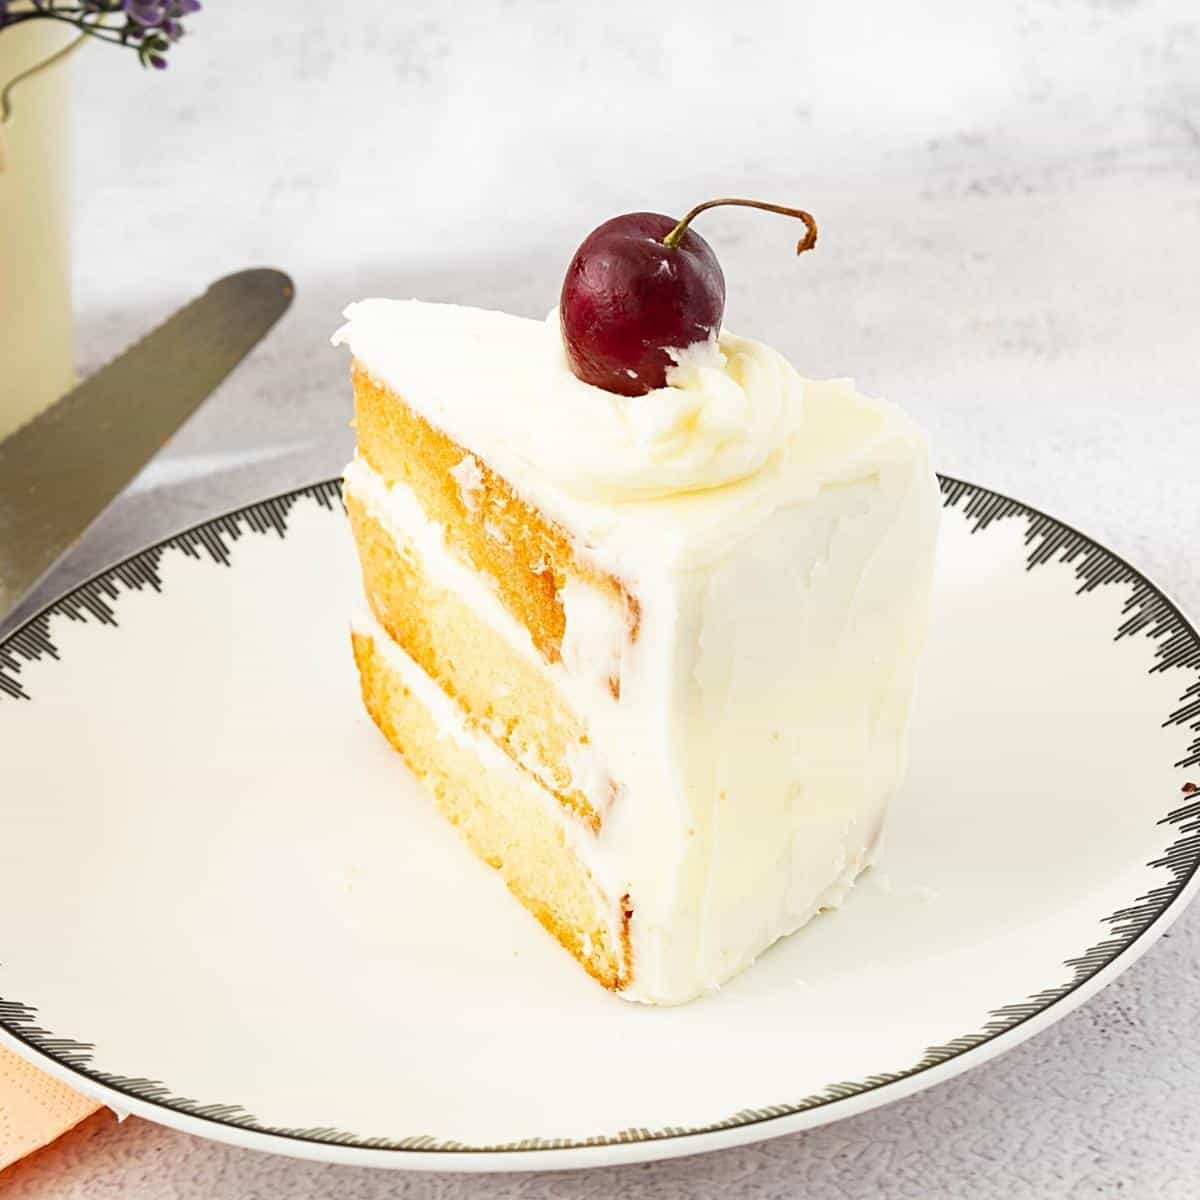 Vanilla sponge cake on a plate.